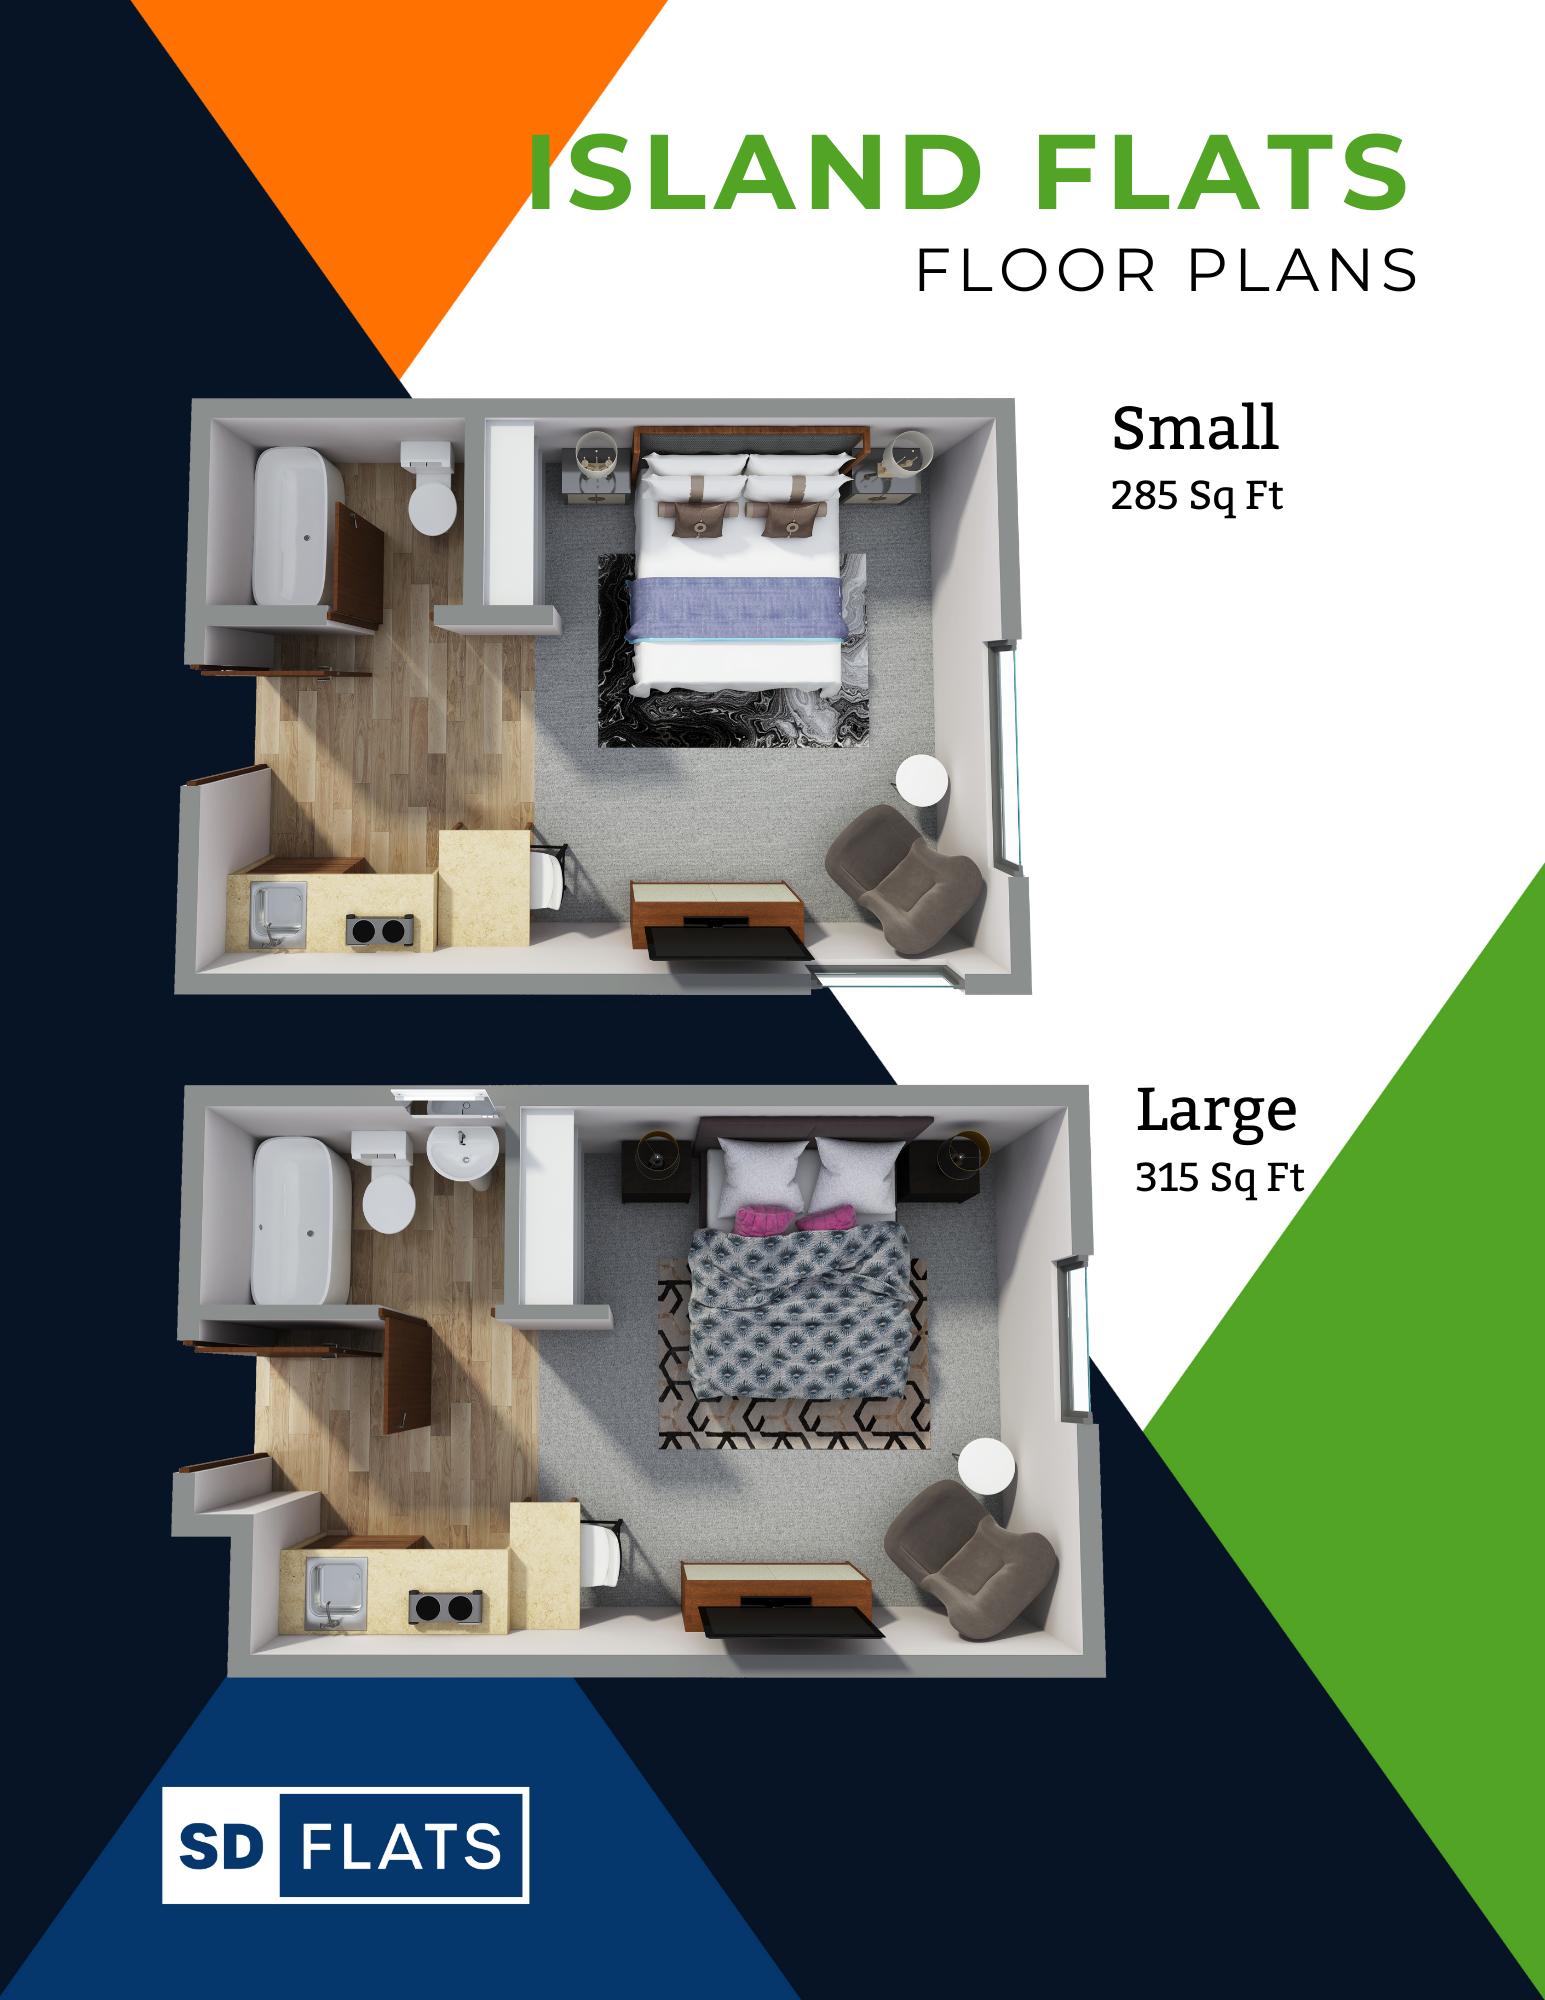 Island Flats Floor Plans